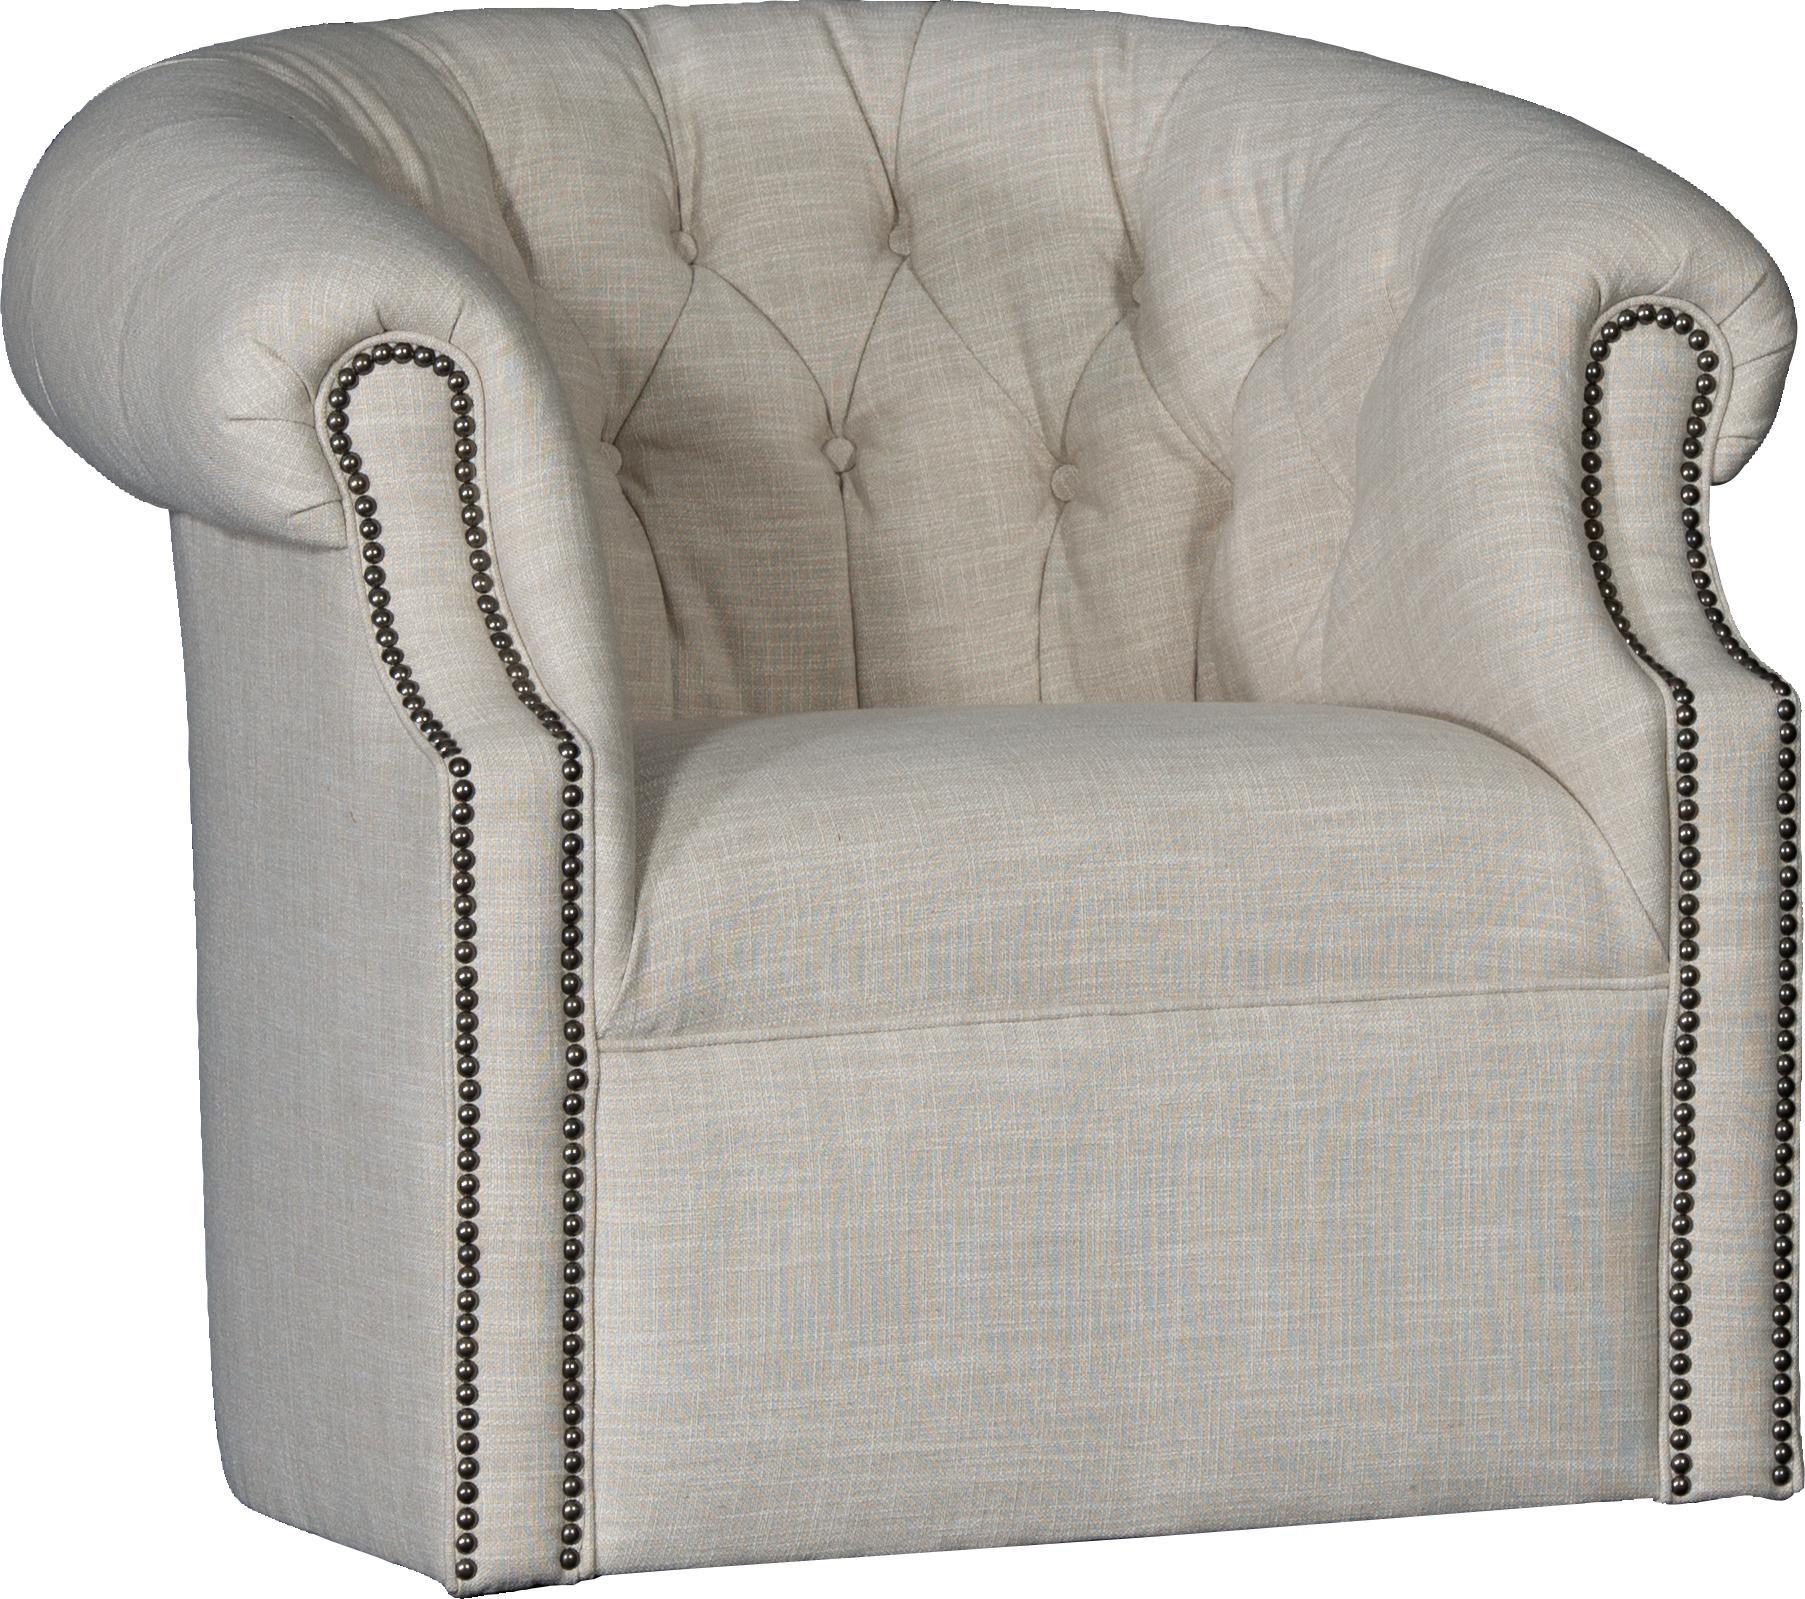 8220 Swivel Chair by Mayo at Pedigo Furniture